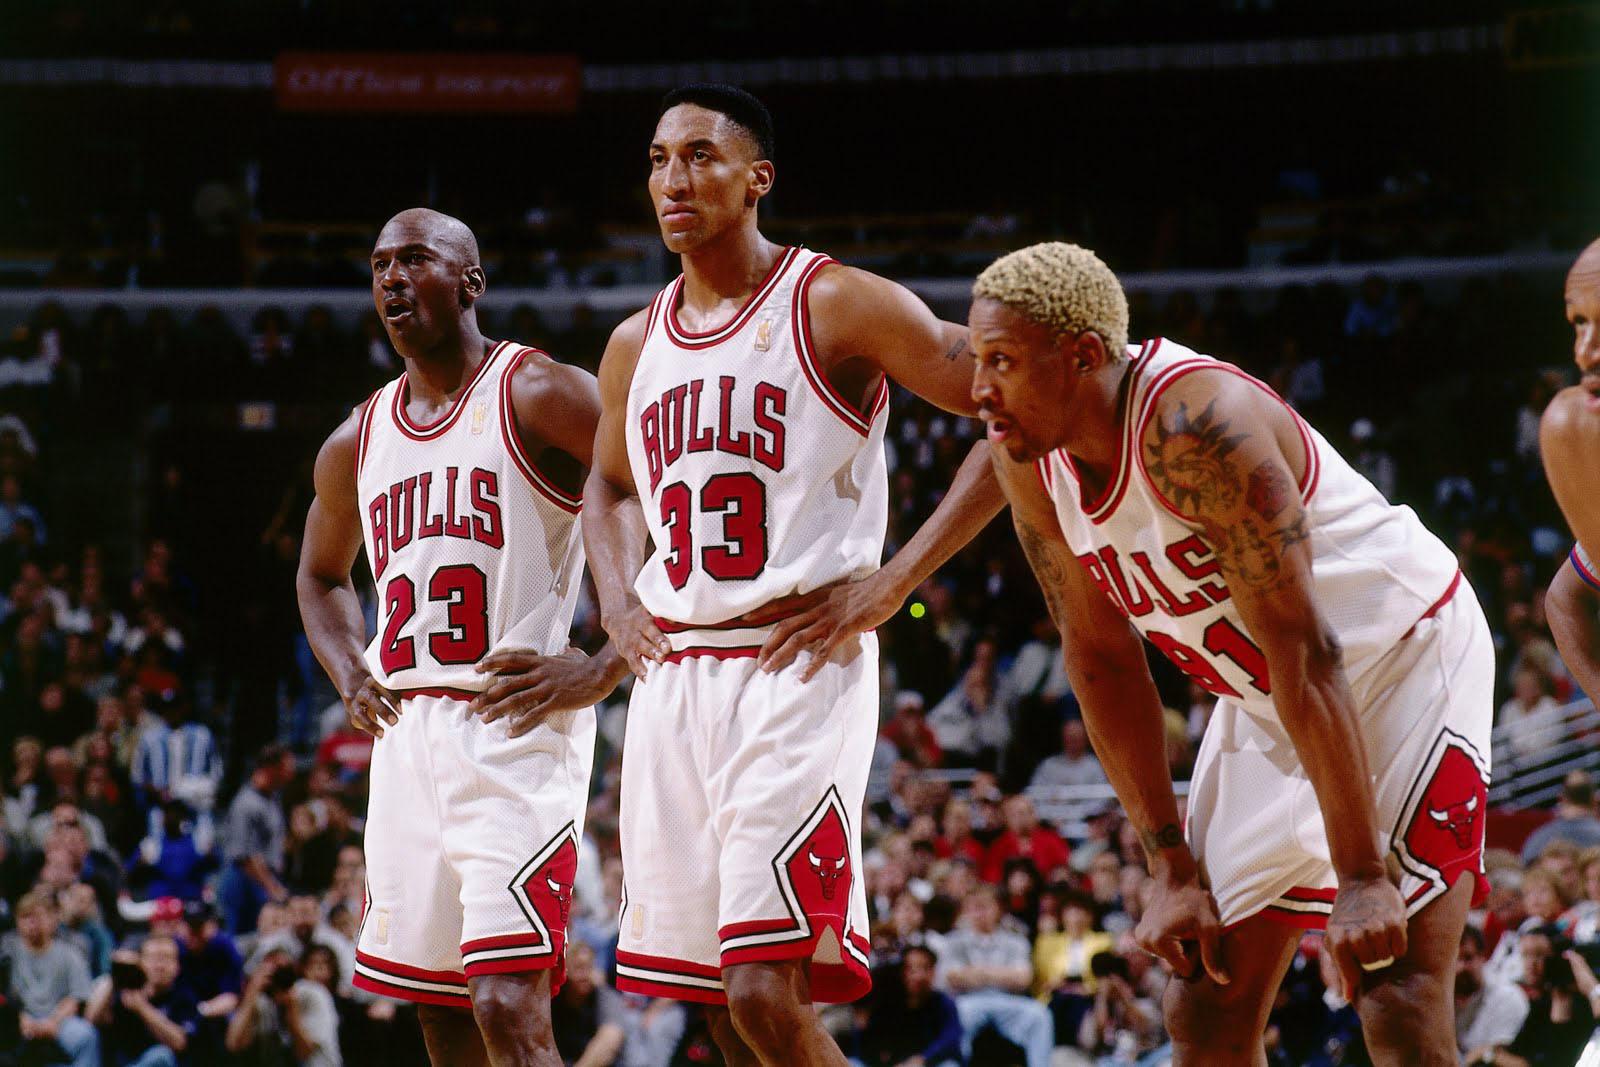 Jordan Bulls Team Top 10 Chicago Bulls Teams of